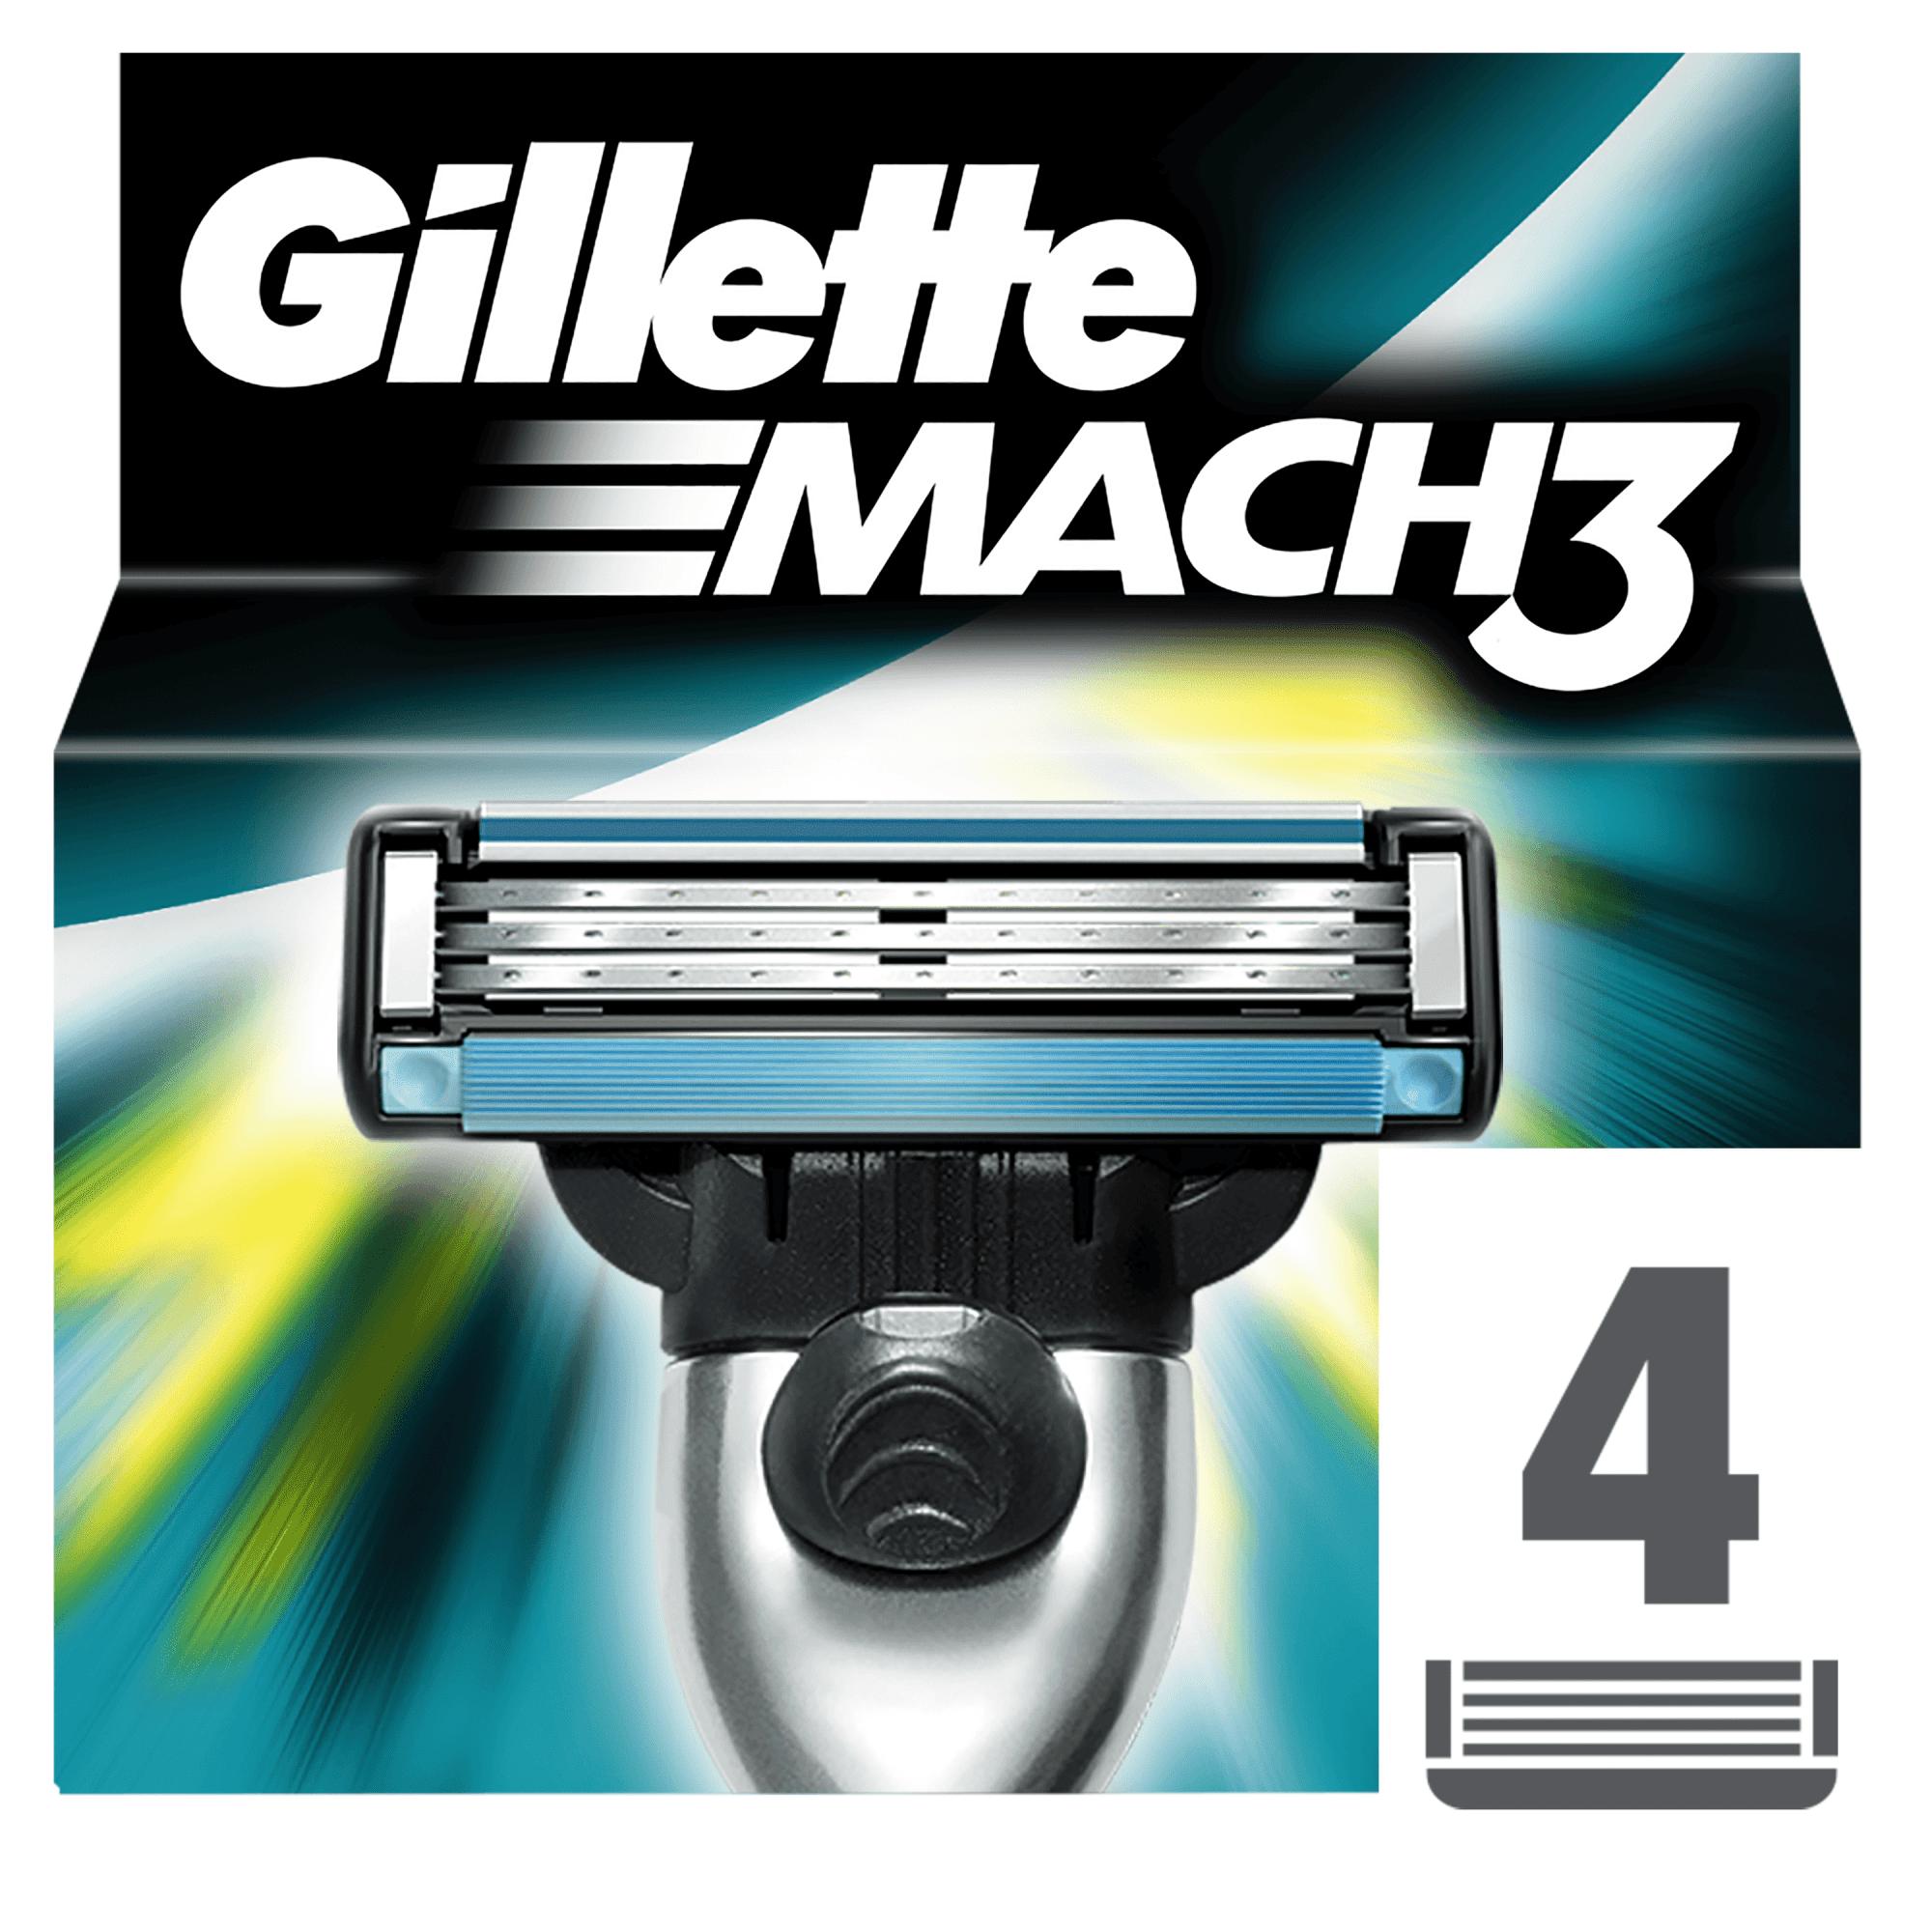 Gillette Mach3 Borotvabetét, 4 db